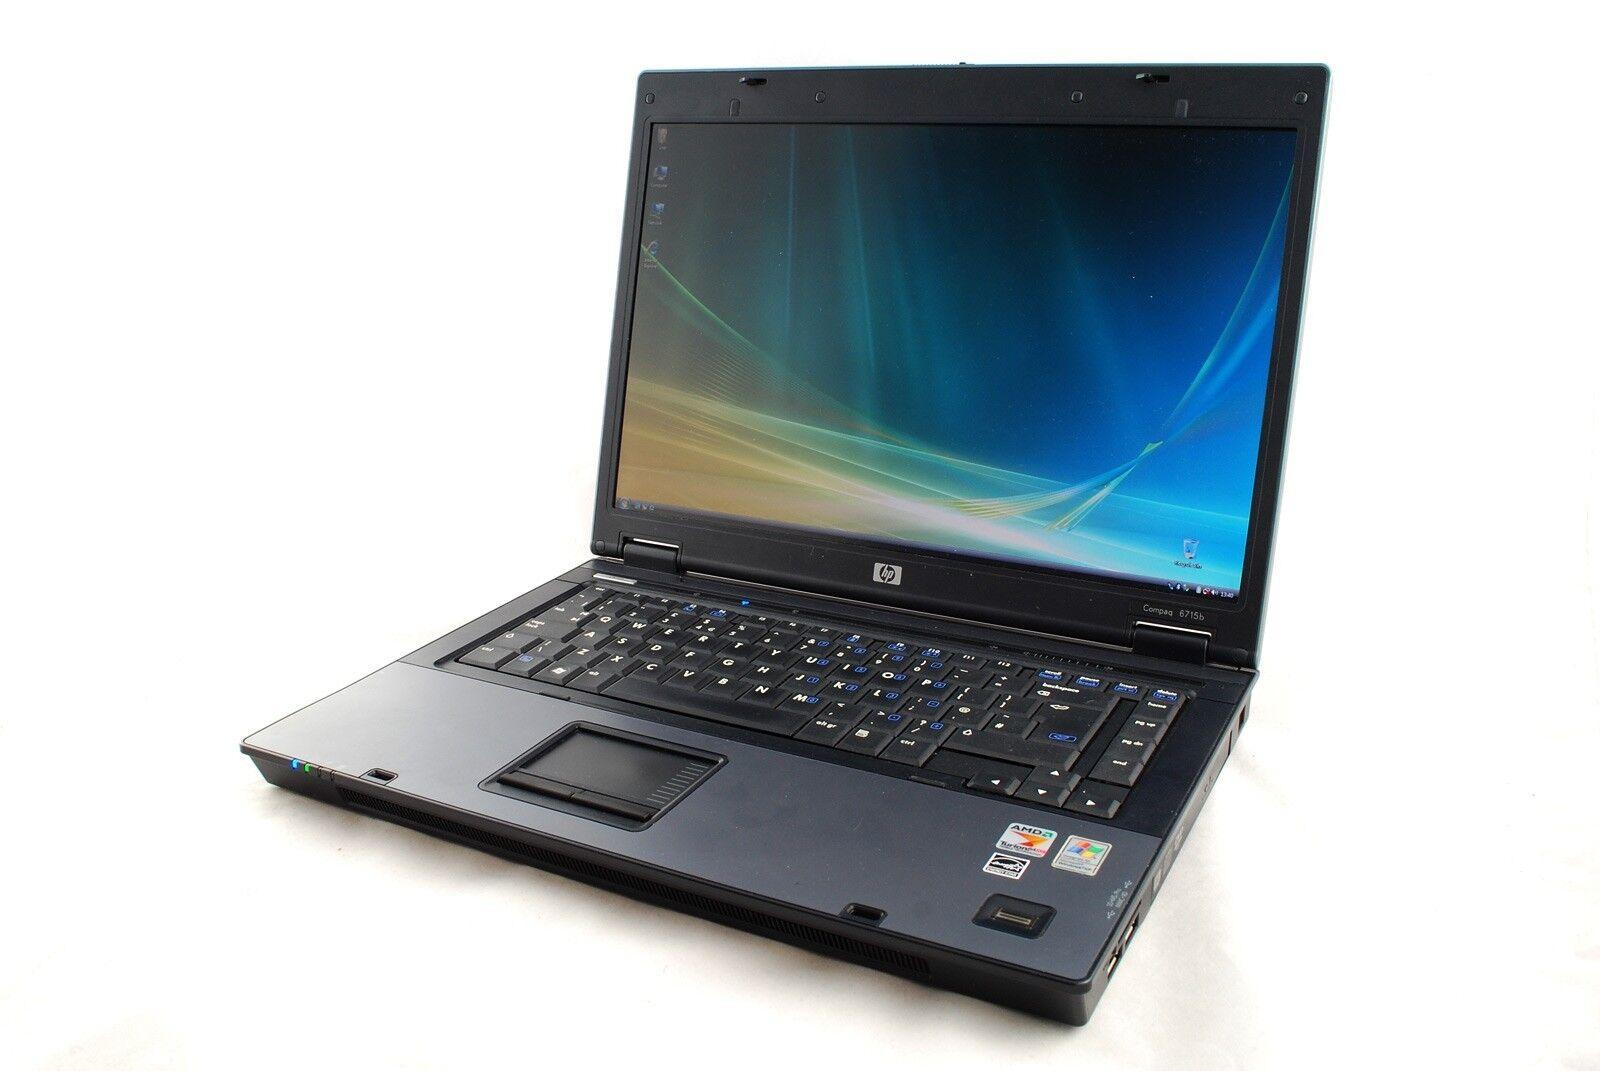 "Laptop Windows - CHEAP FAST HP COMPAQ 6715 15.4"" AMD 4GB RAM 250GB HDD DVDRW WINDOWS 7 LAPTOP"